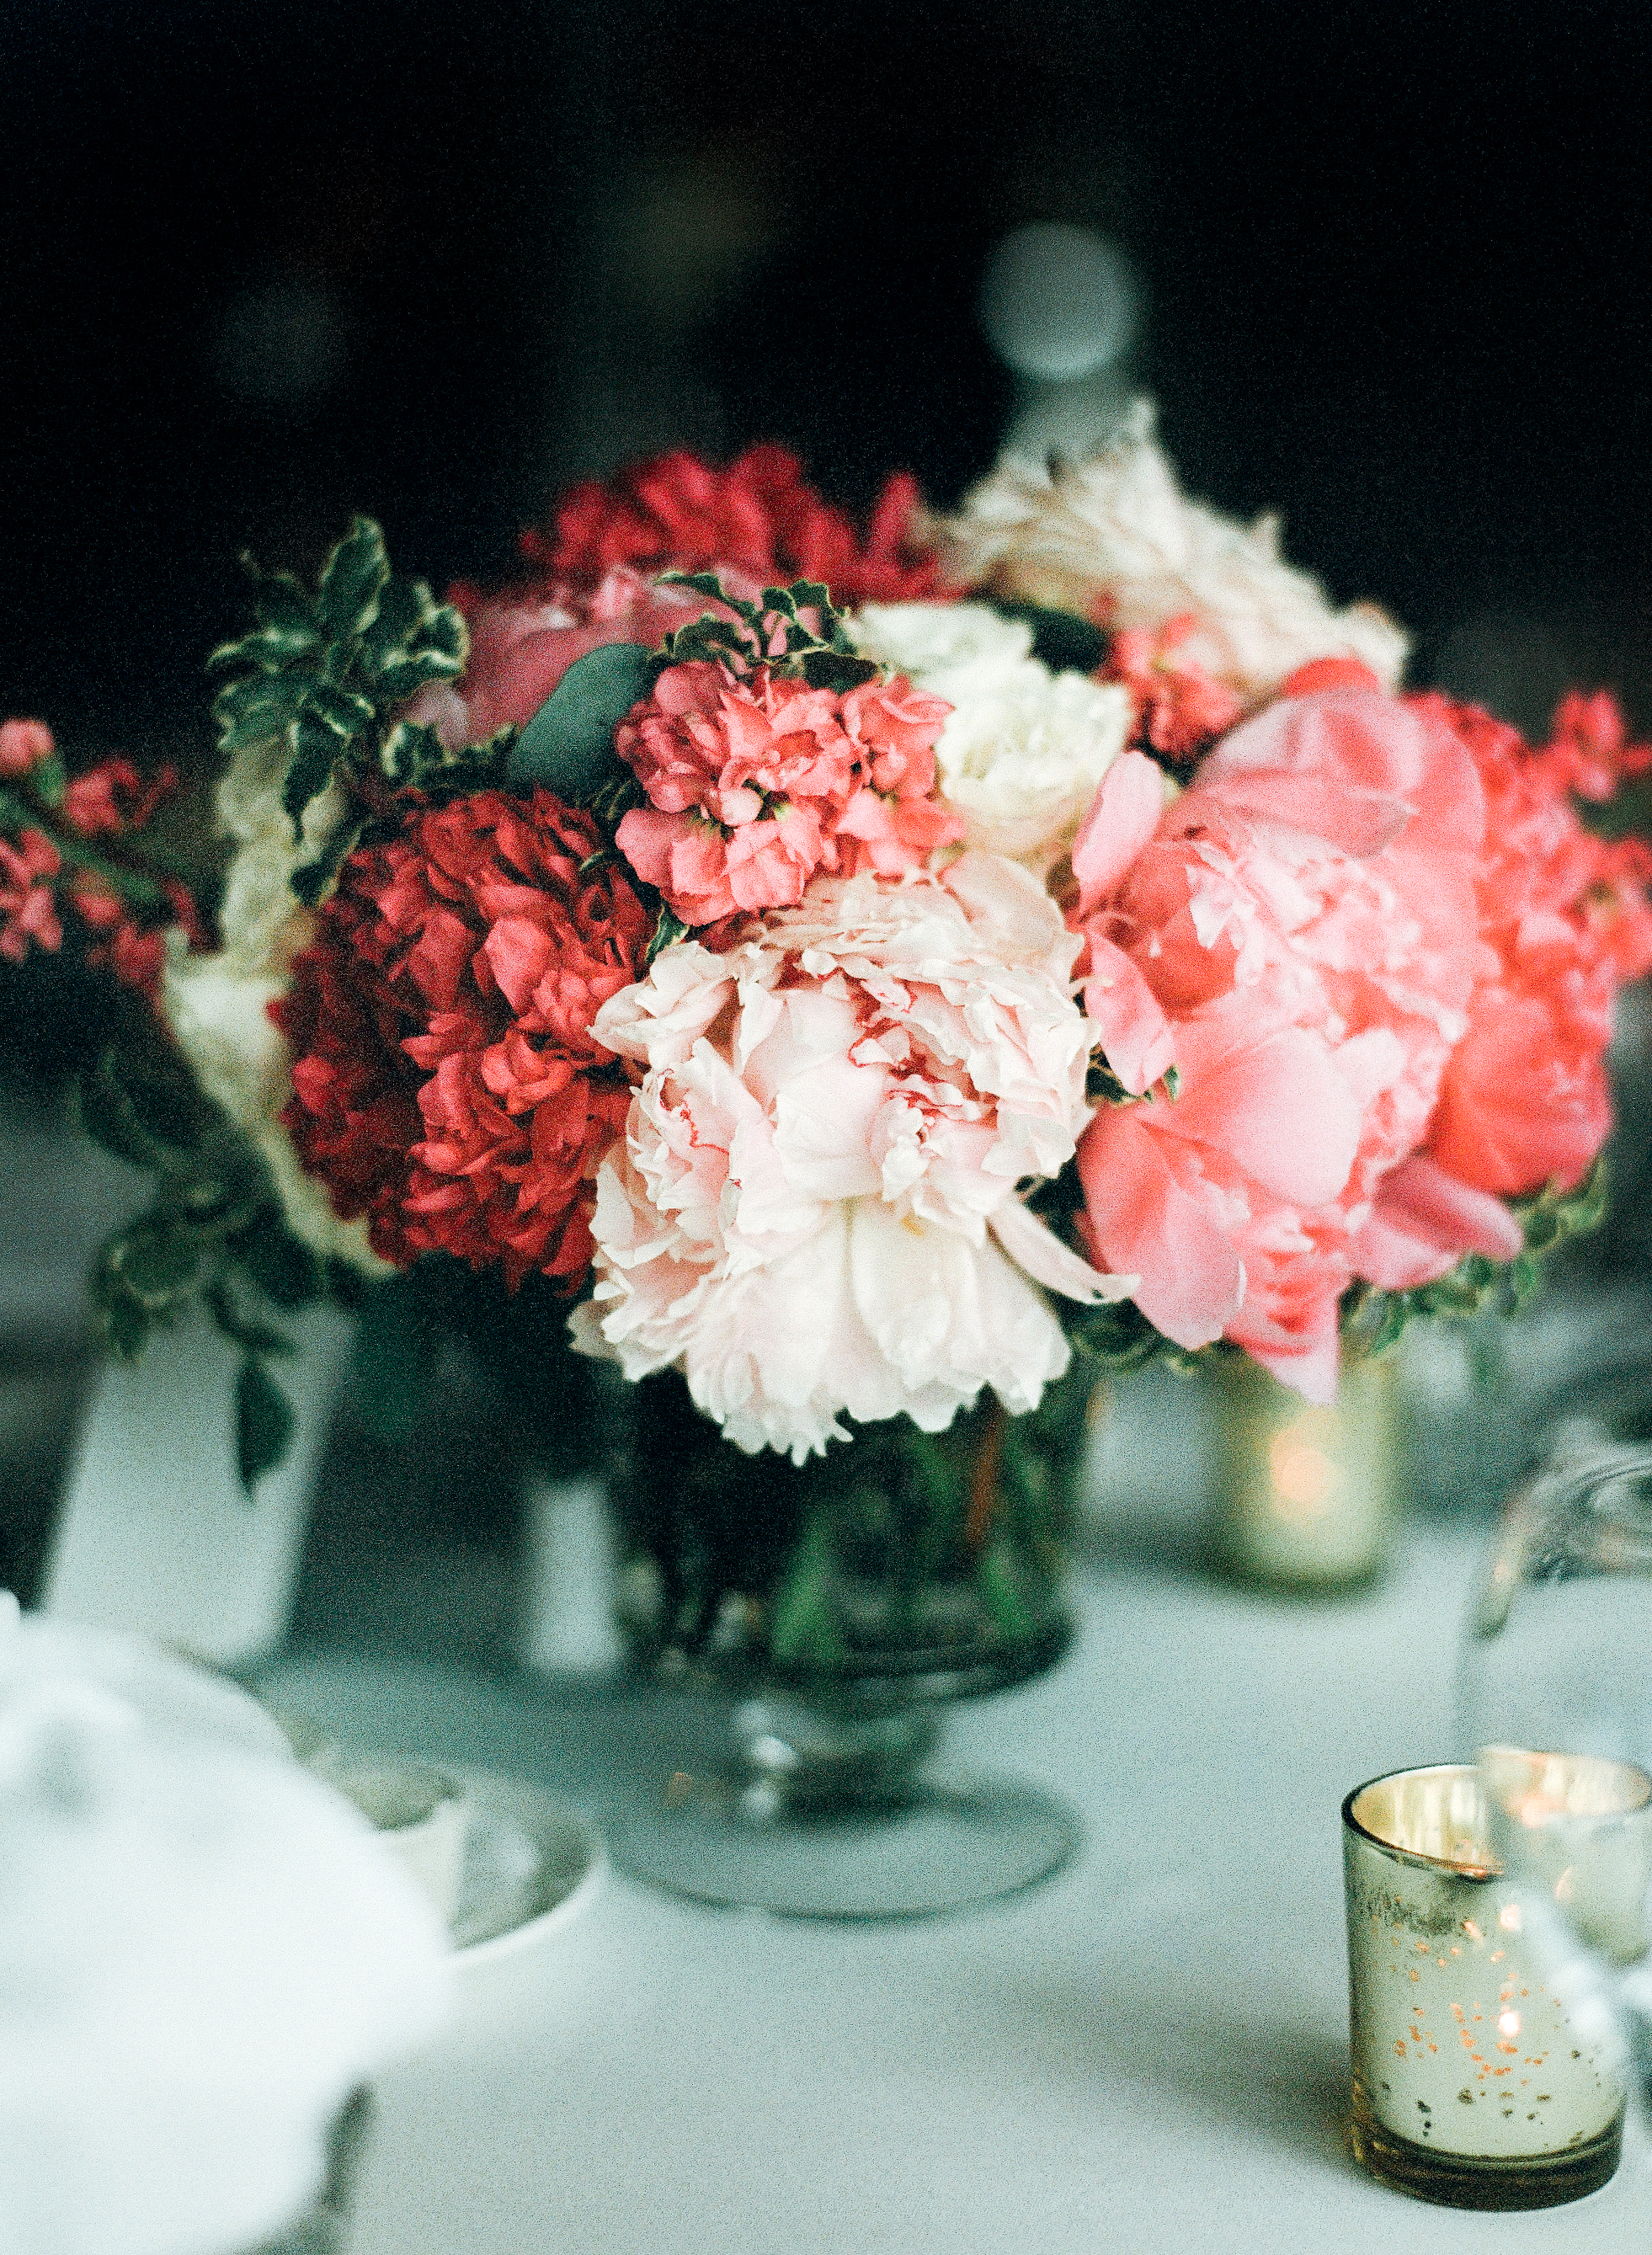 Photo credit: Analog Wedding